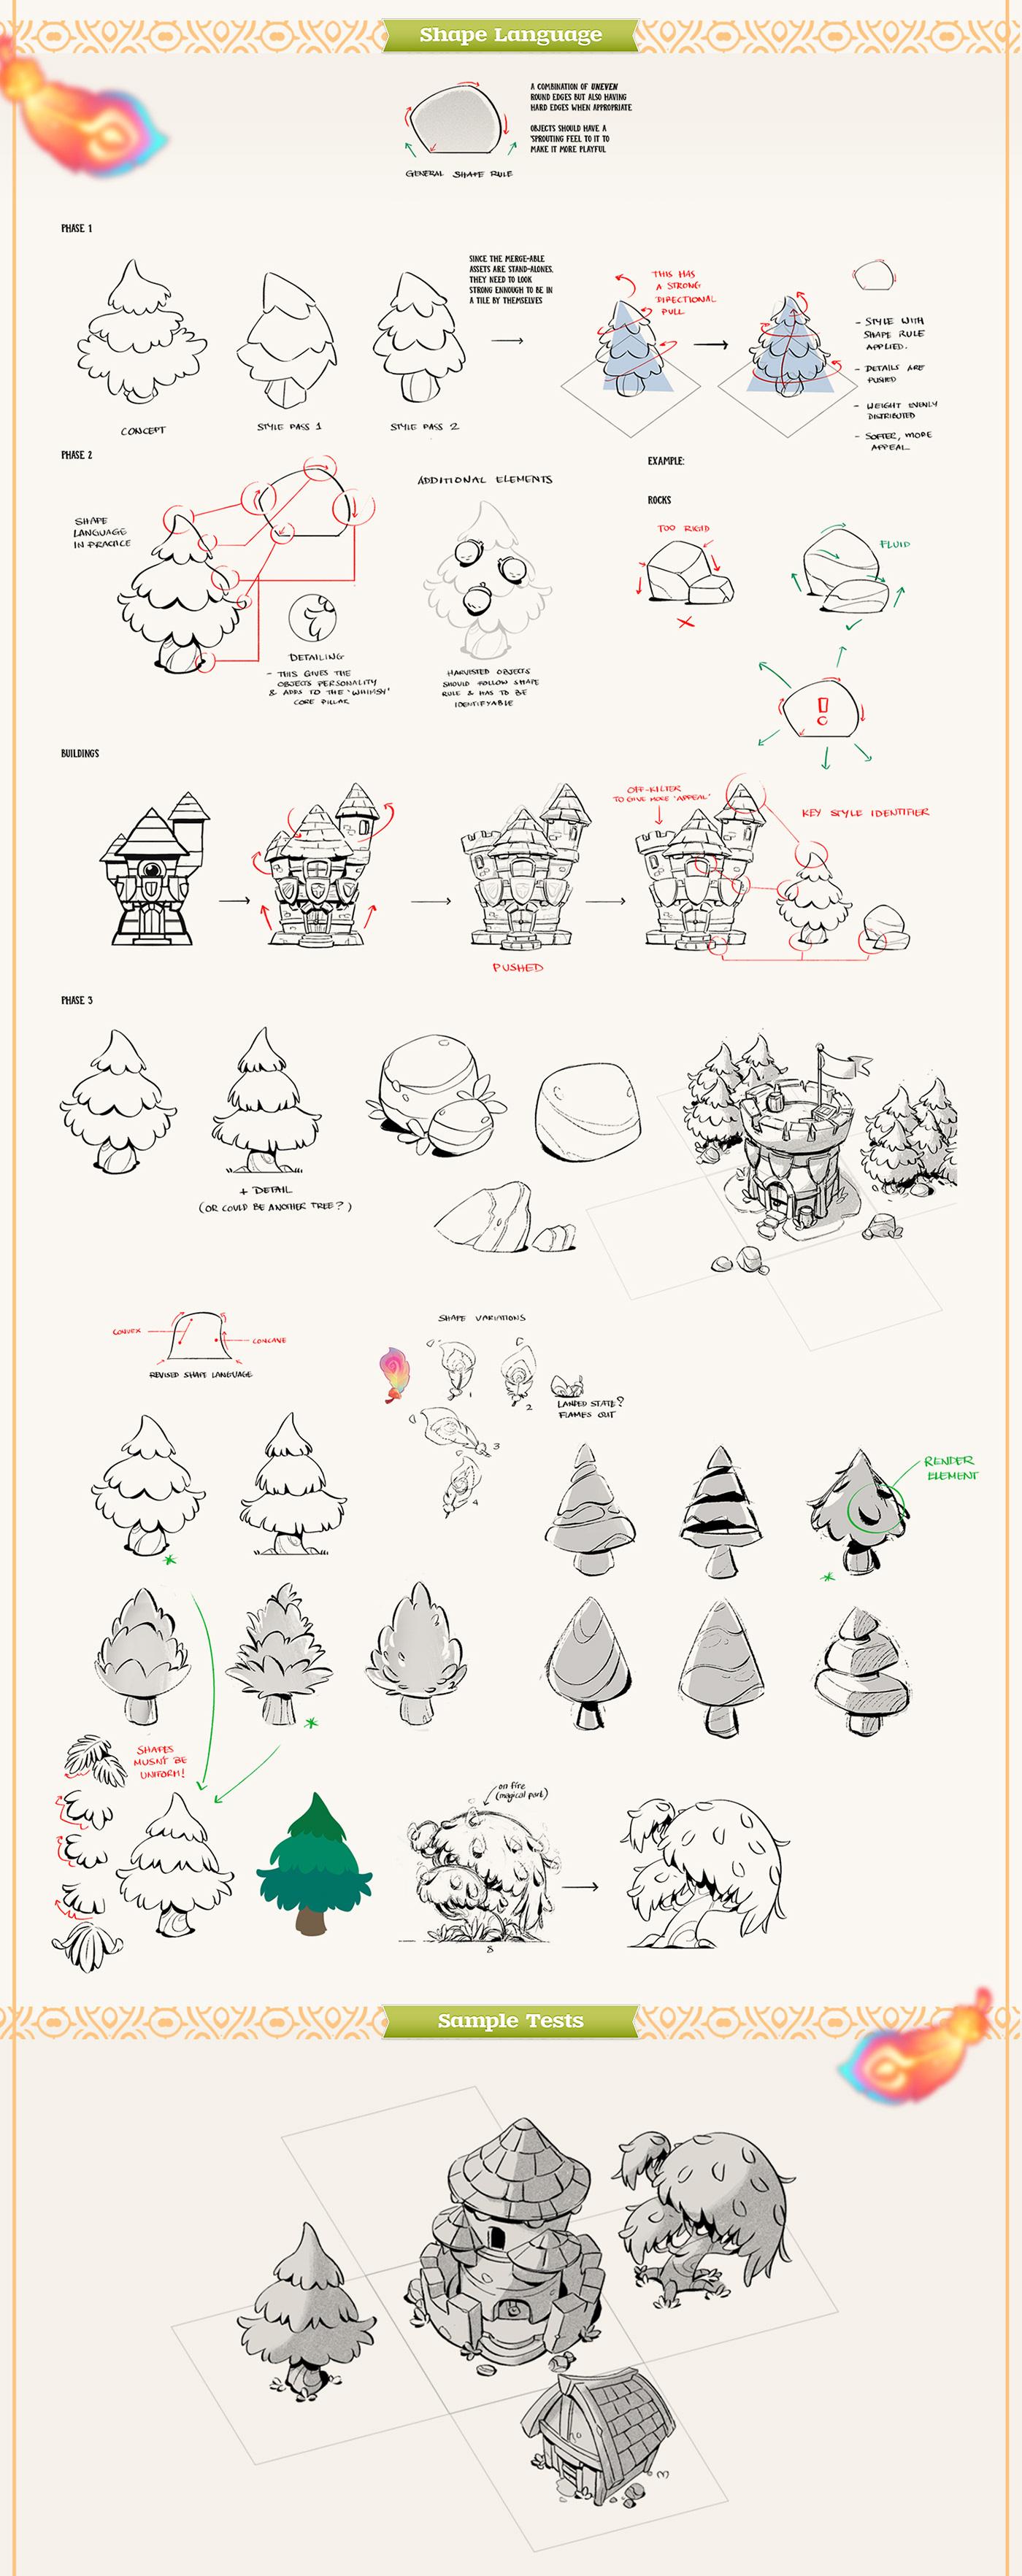 game design  gameart gramgames mergekingdom mobilegames photoshop previsualisation Previz sketches